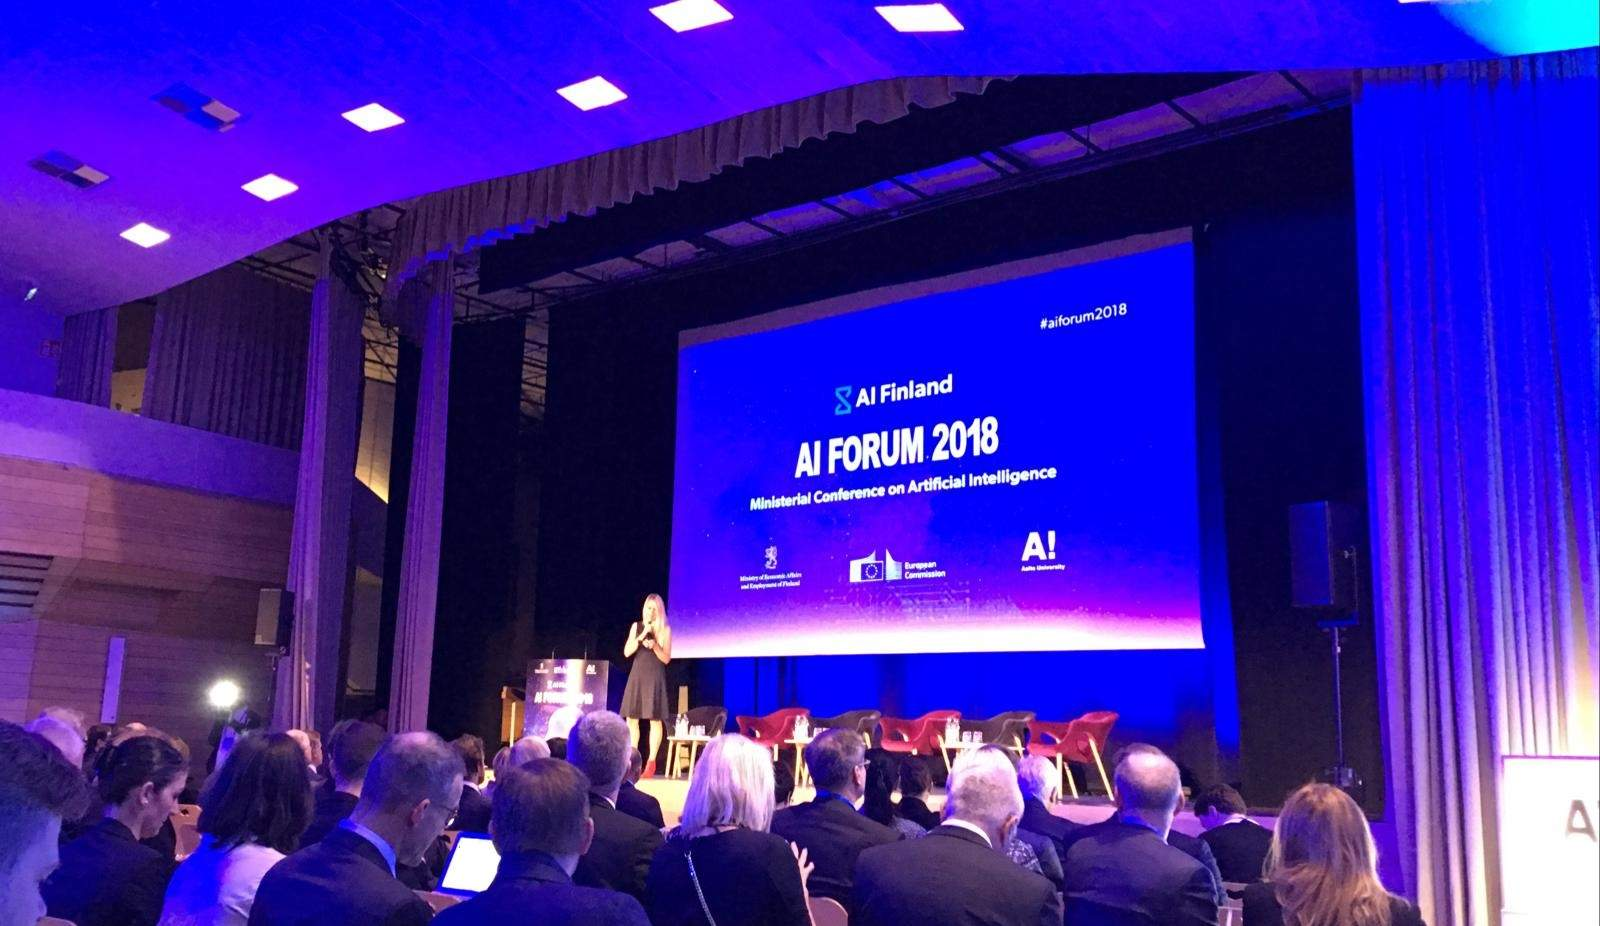 AI Forum 2018